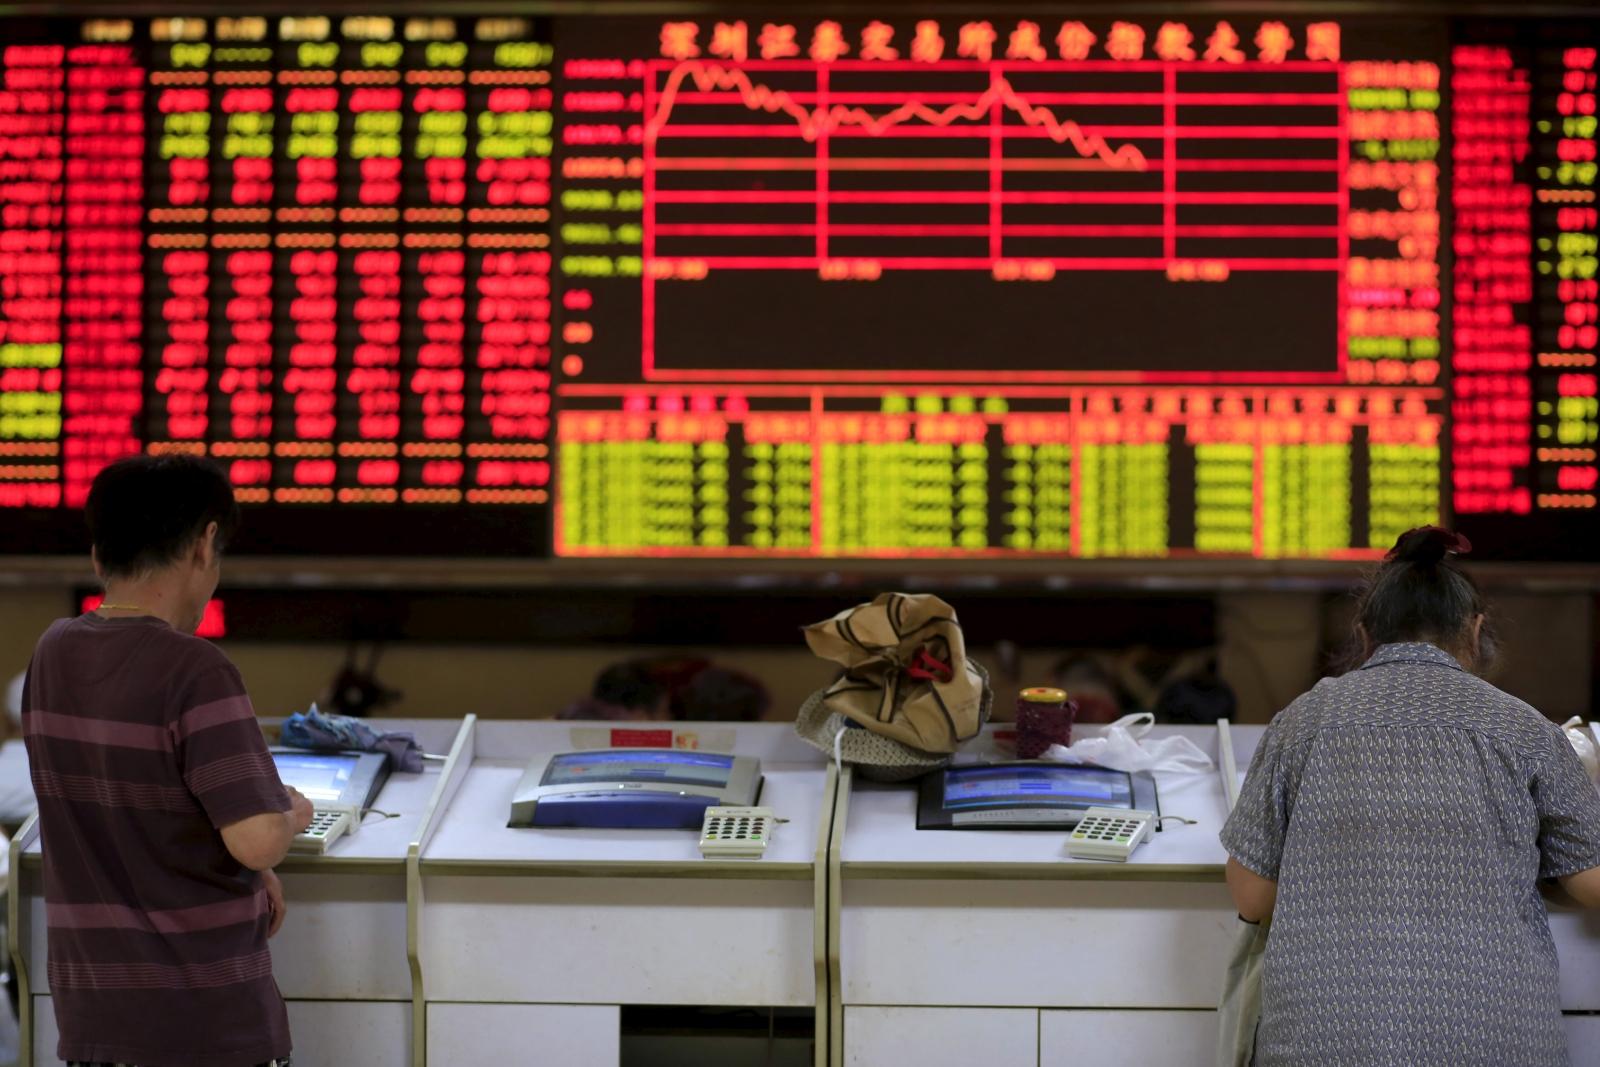 Asian markets: Shanghai Composite slips despite easing Brexit concerns